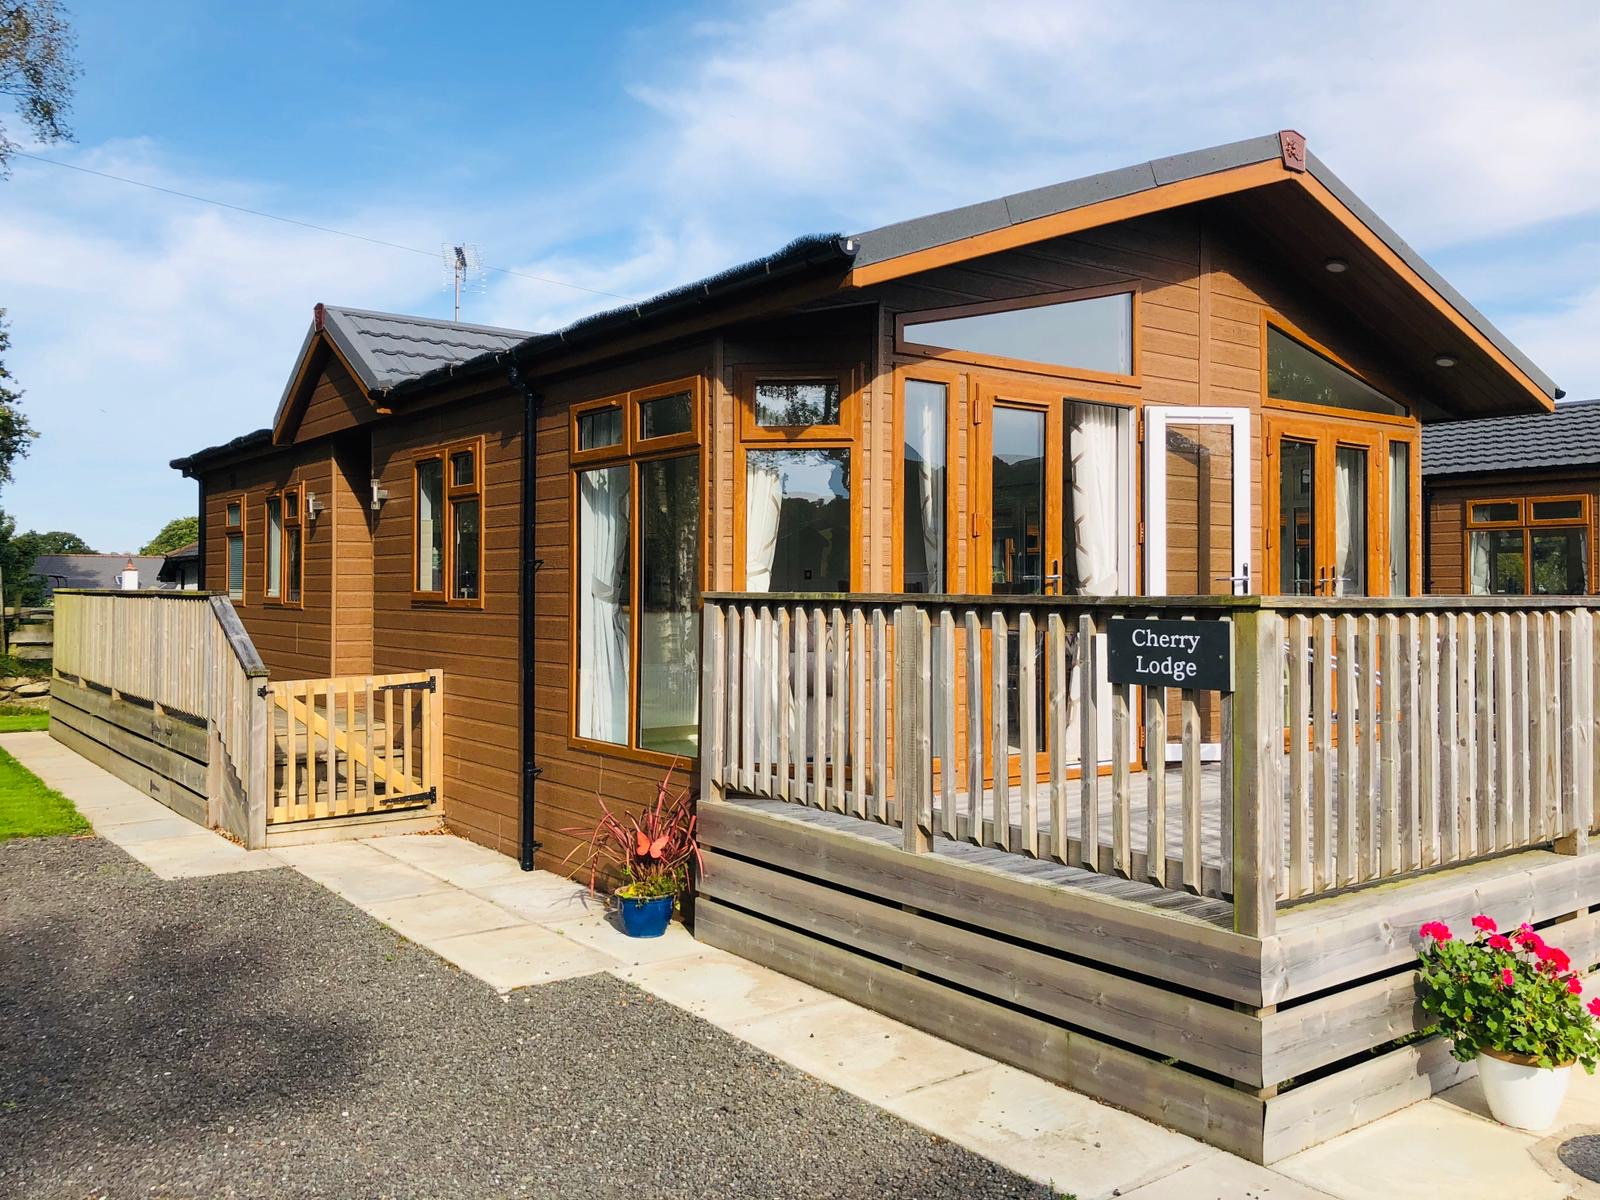 2 Bedroom Luxury Lodges for sale, Devon